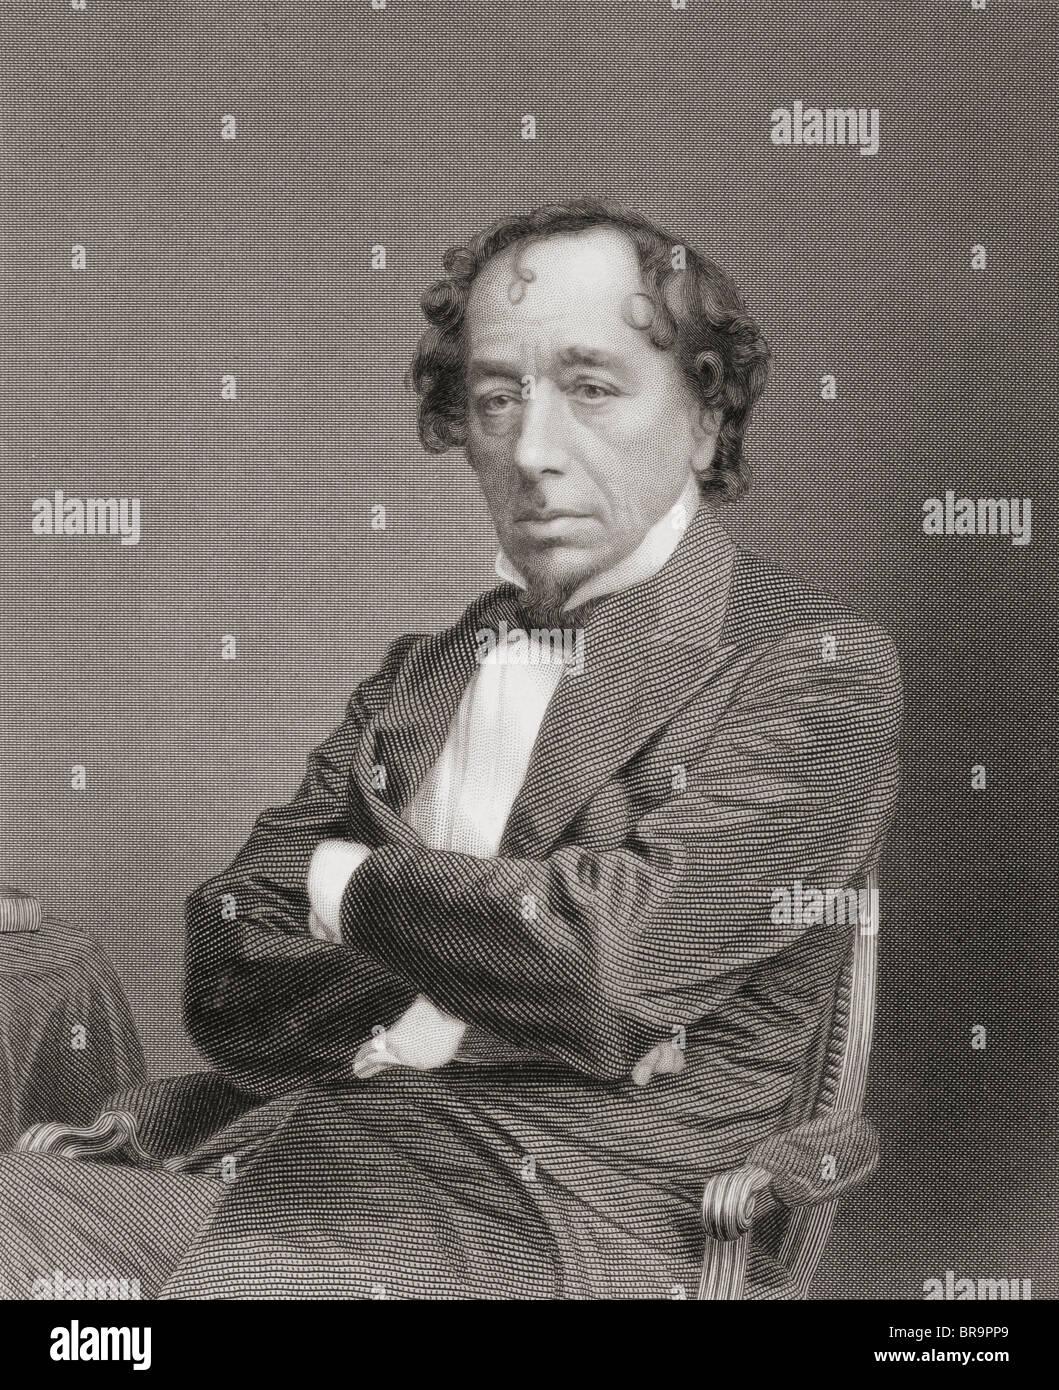 Benjamin Disraeli, 1st Earl of Beaconsfield, 1804 to 1881. British Prime Minister. Stock Photo